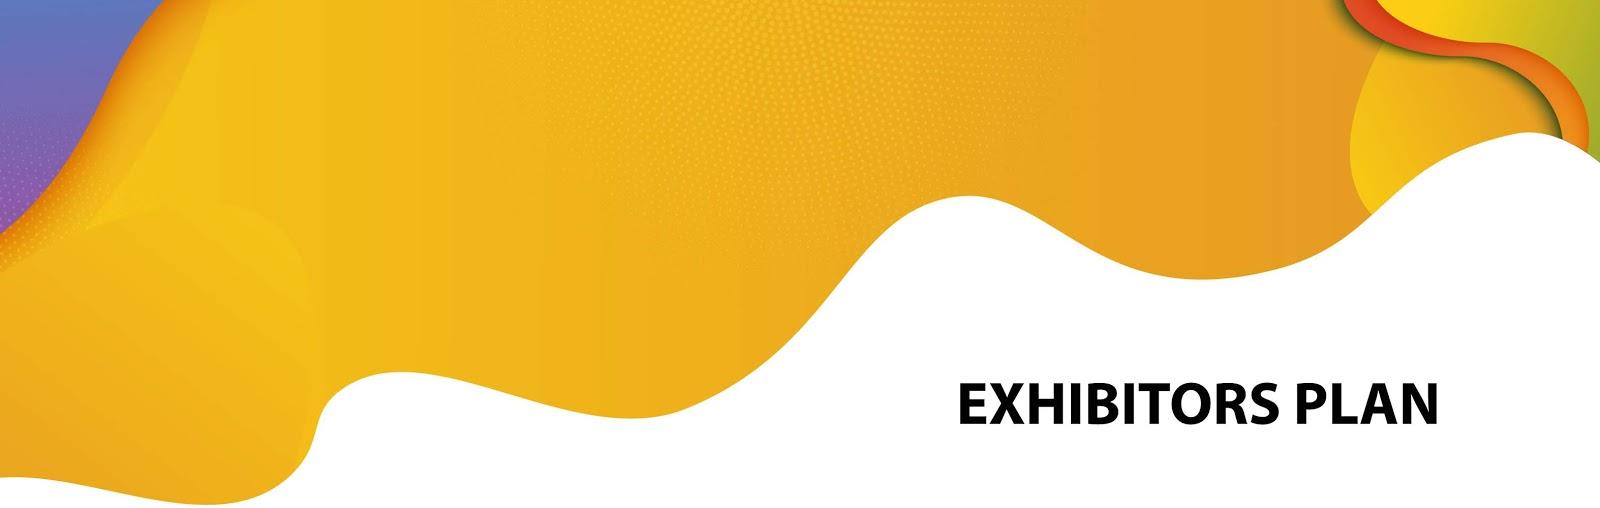 Exhibitors Layout